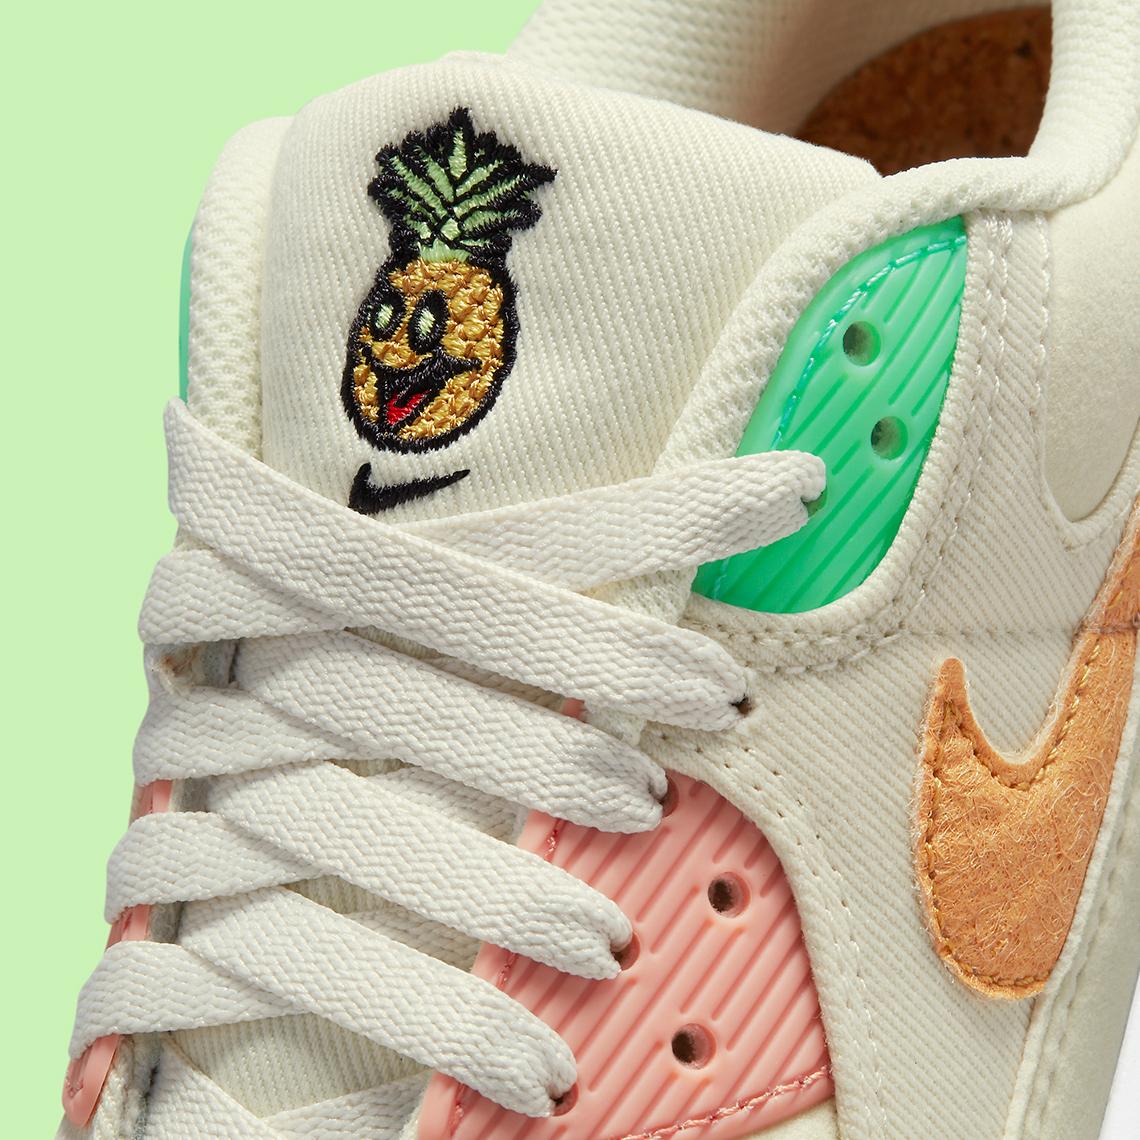 Nike Air Max 90 Happy Pineapple